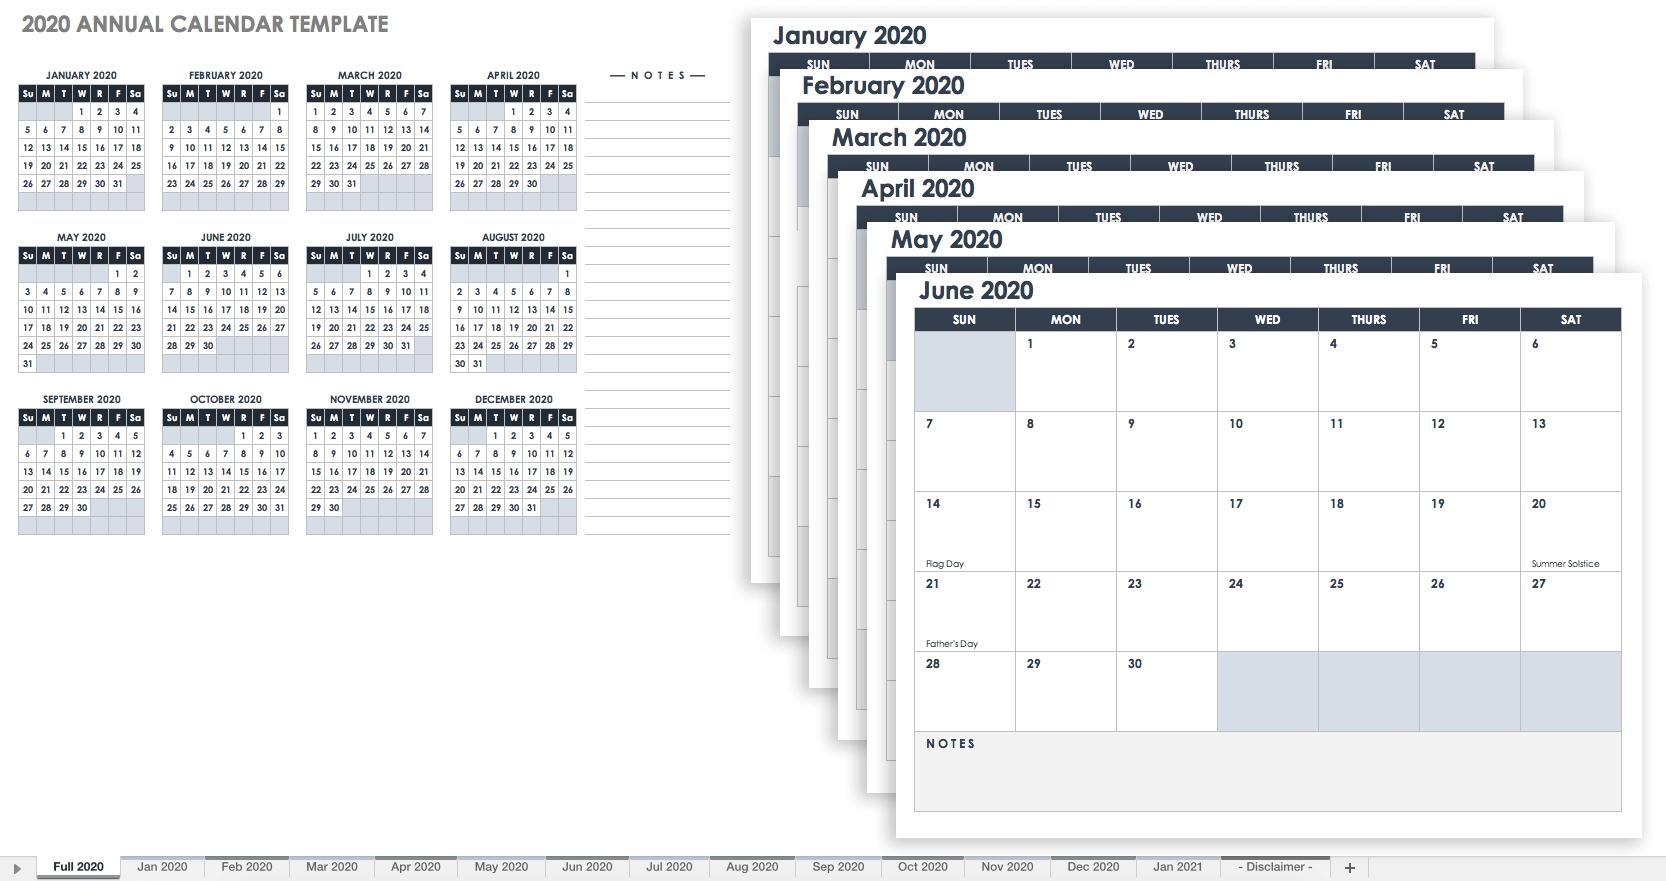 Free Excel Calendar Templates-Blank Quarterly Calendar Printable 2020